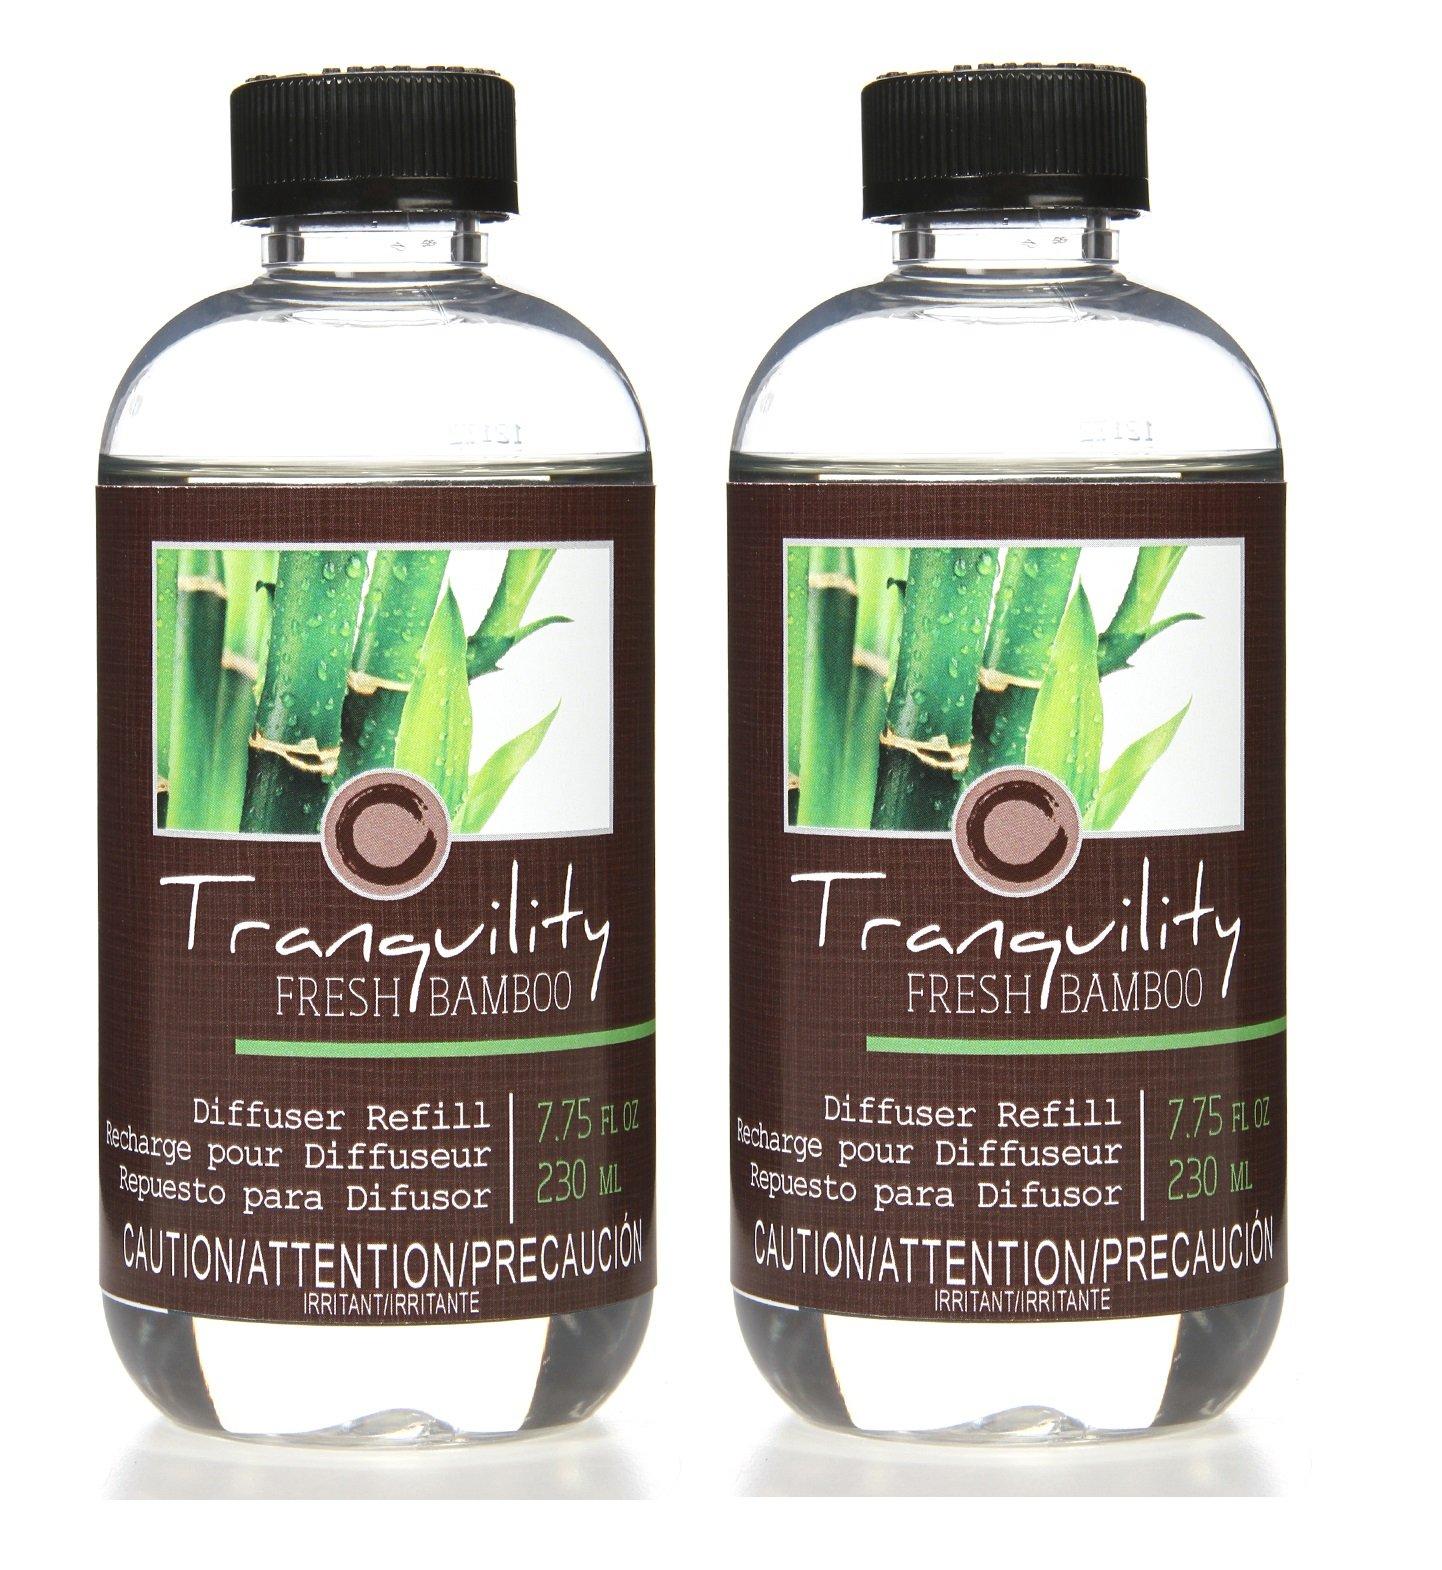 Hosley Aromatherapy Set of 2 Premium Fresh Bamboo Reed Diffuser Refills Oil, 230 ml (7.75 fl oz) Made in USA. Bulk Buy. Ideal Gift for Weddings, Spa, Reiki, Meditation Settings O4